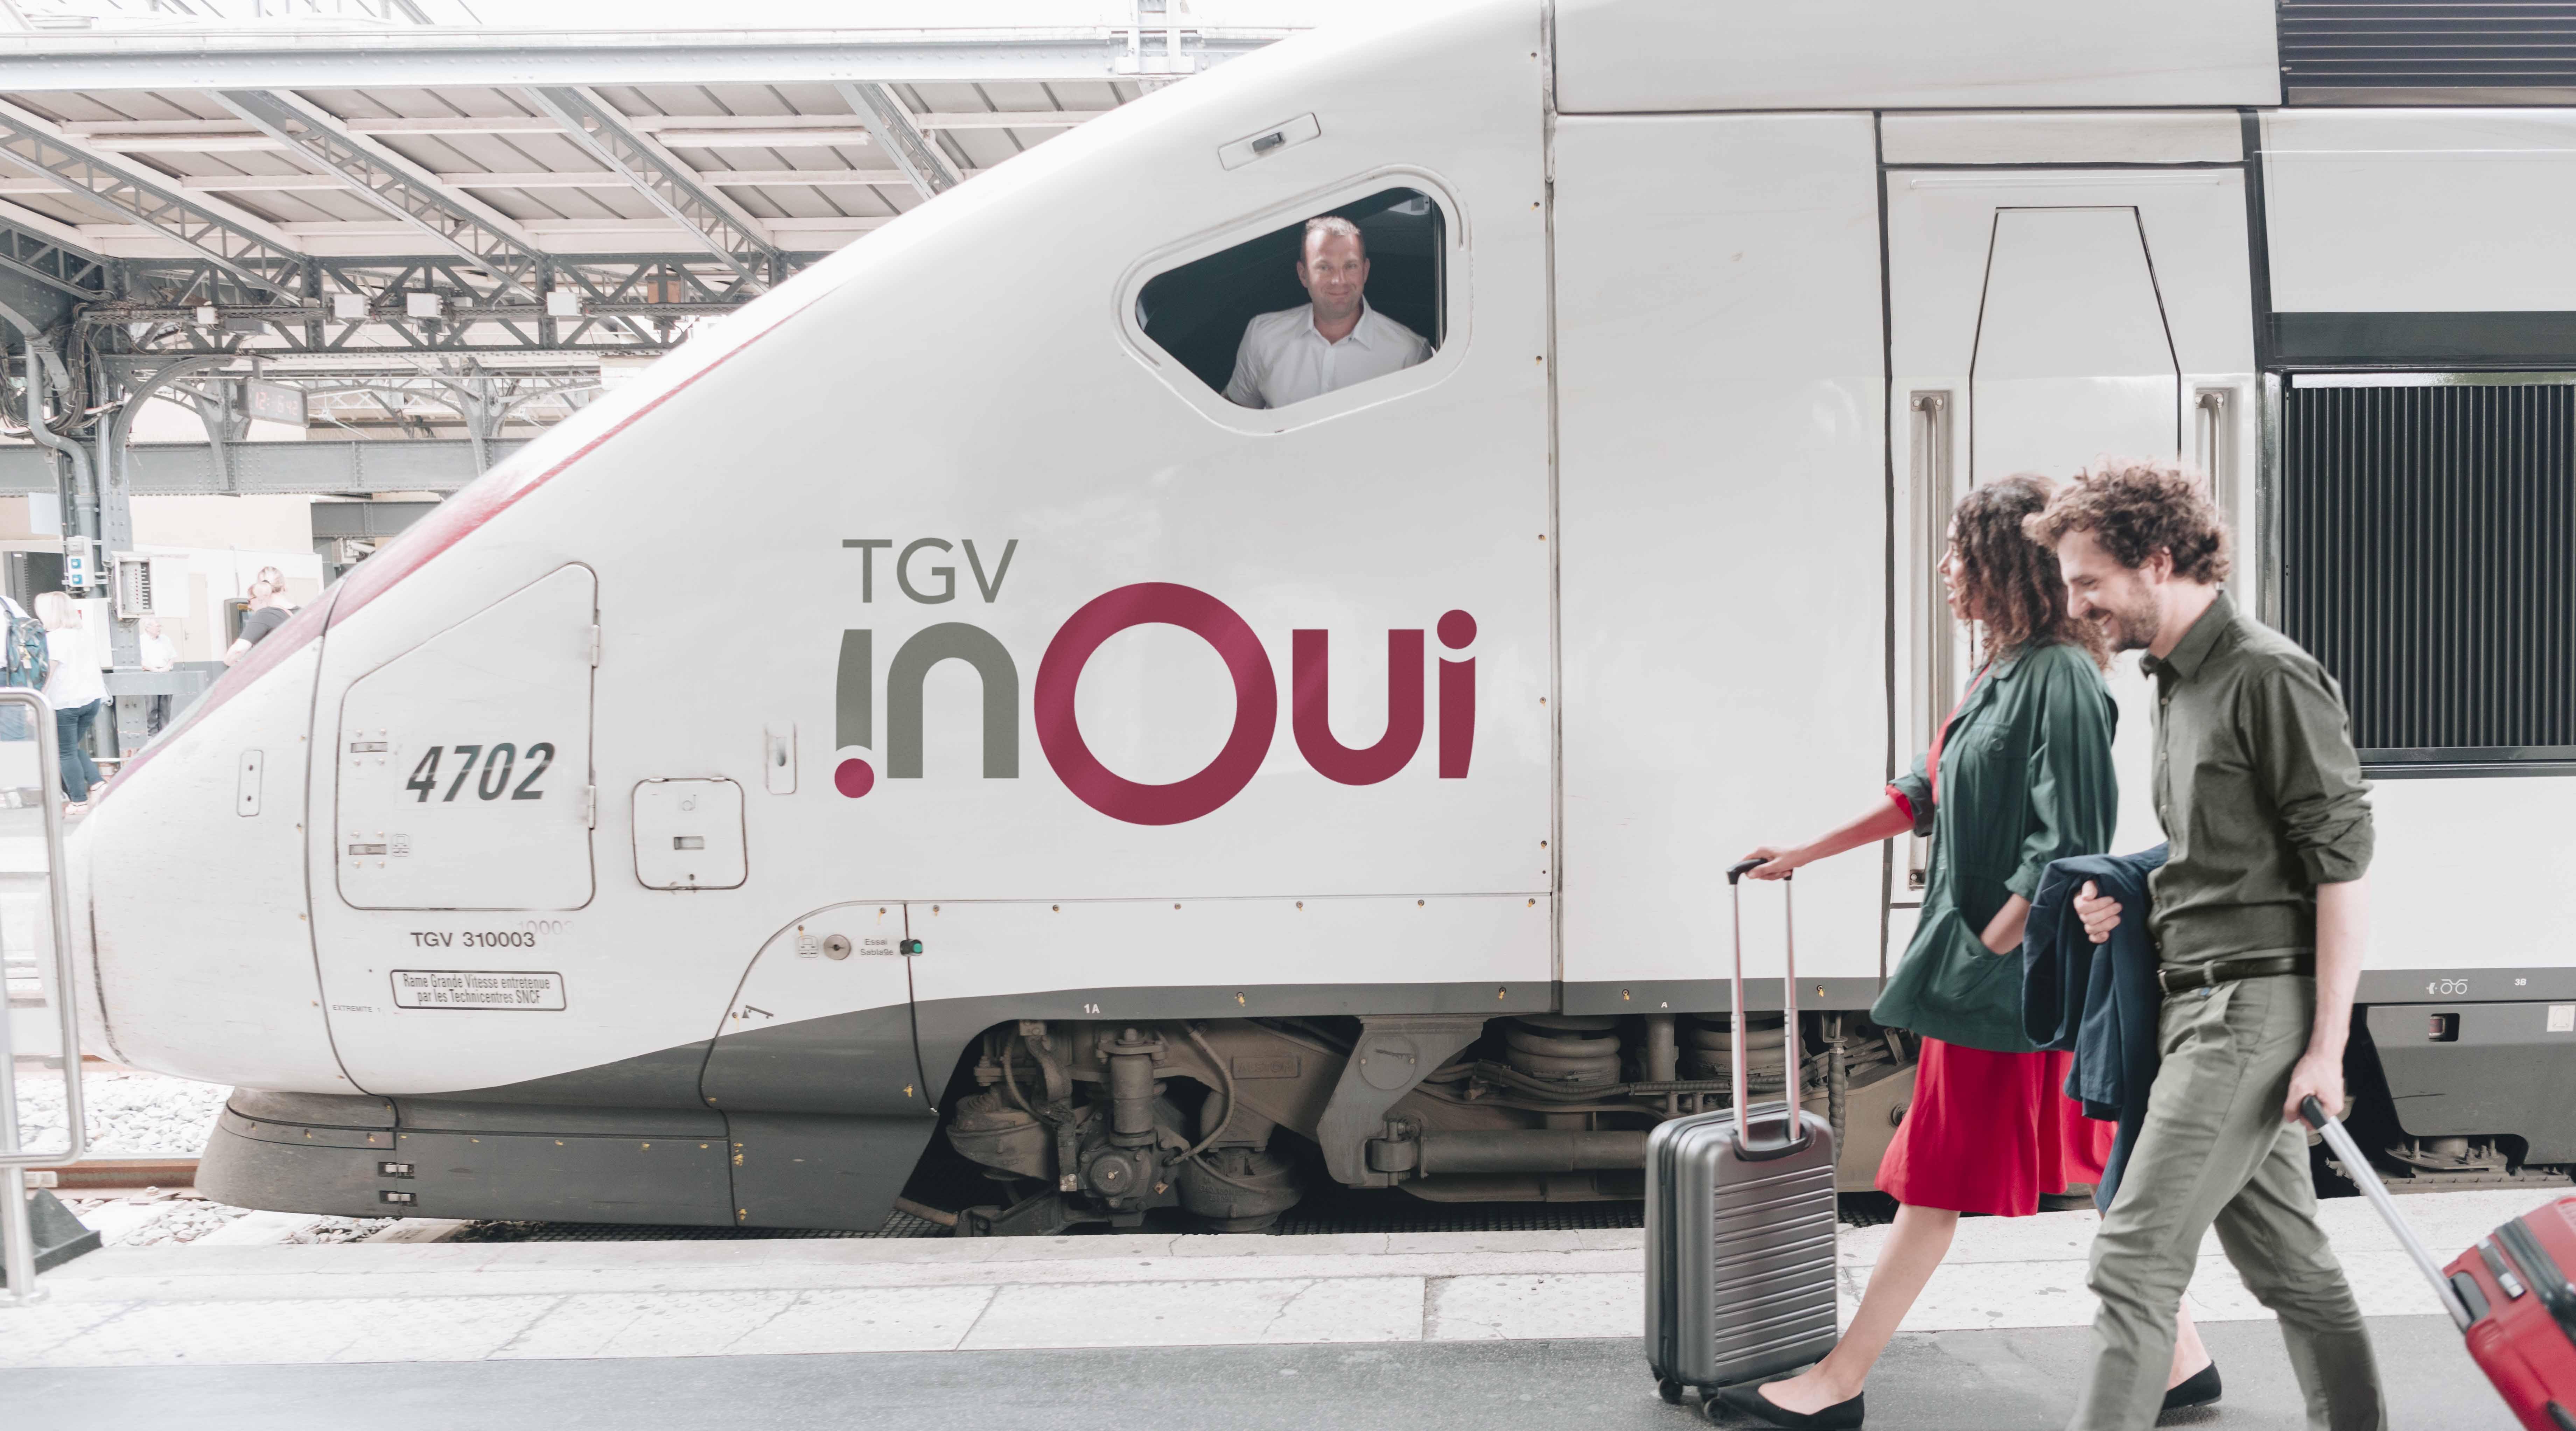 LLE-TGV-INOUI-2018-alexandre_le_fur-Flint_production.jpg